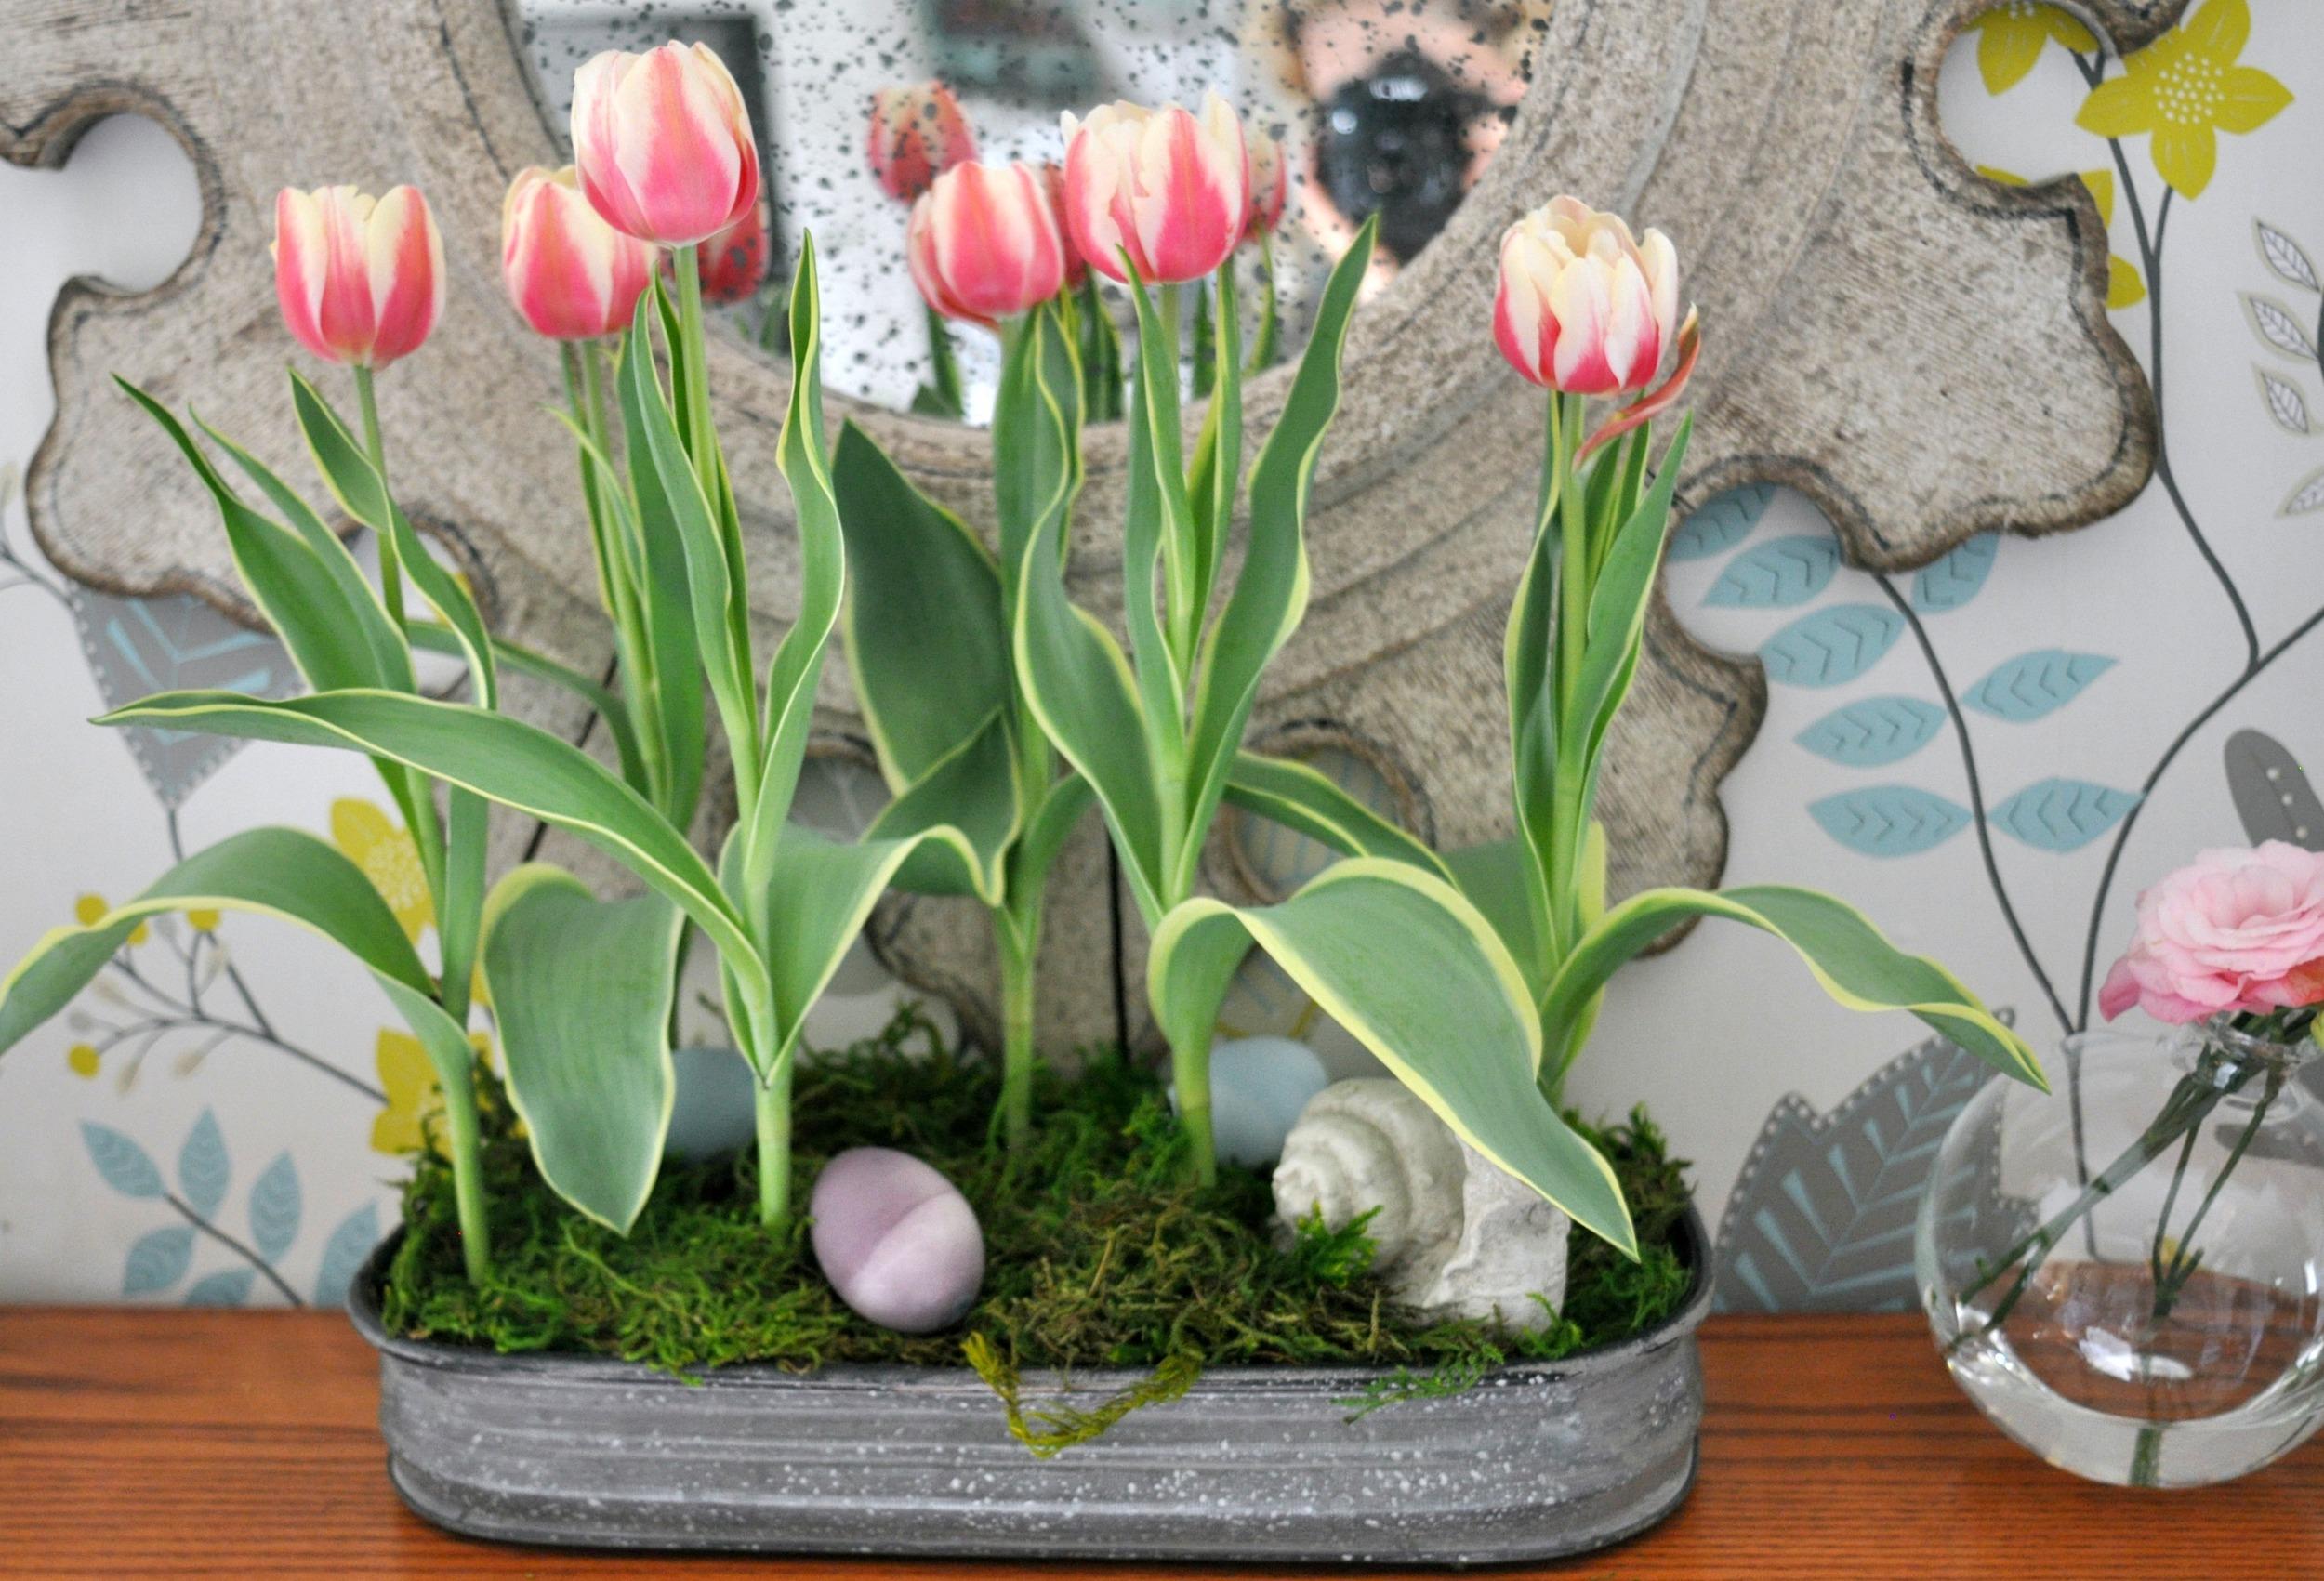 tulips_on_mantel